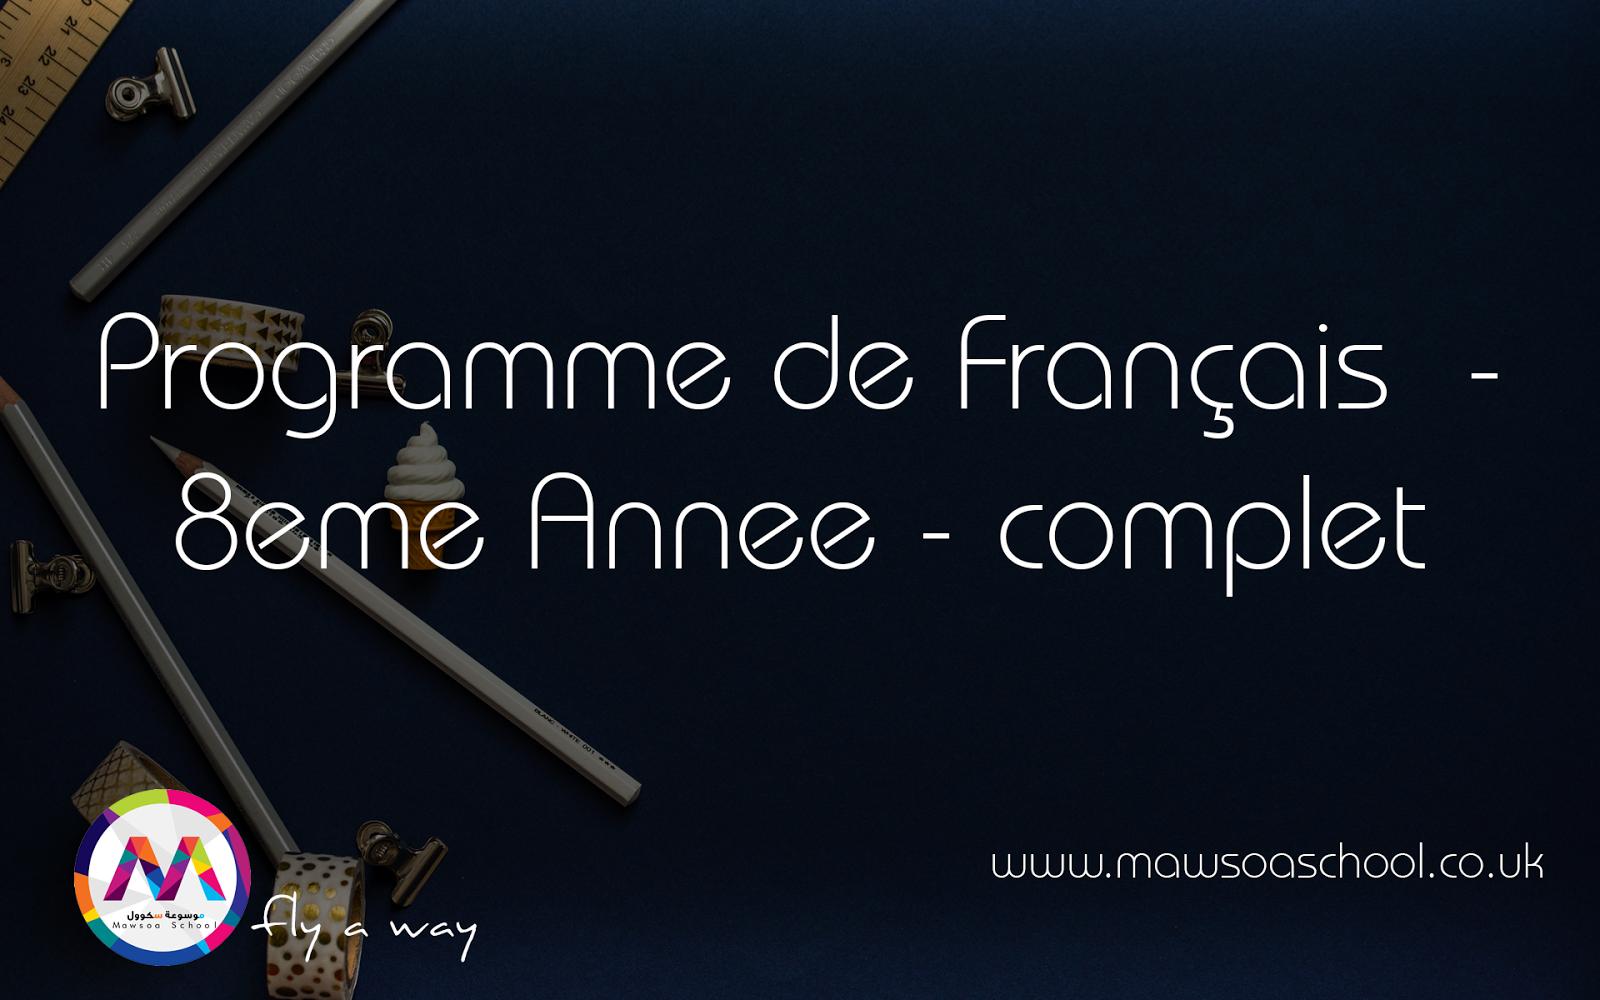 Programme De Francais 8eme Annee Complet Mawsoa School